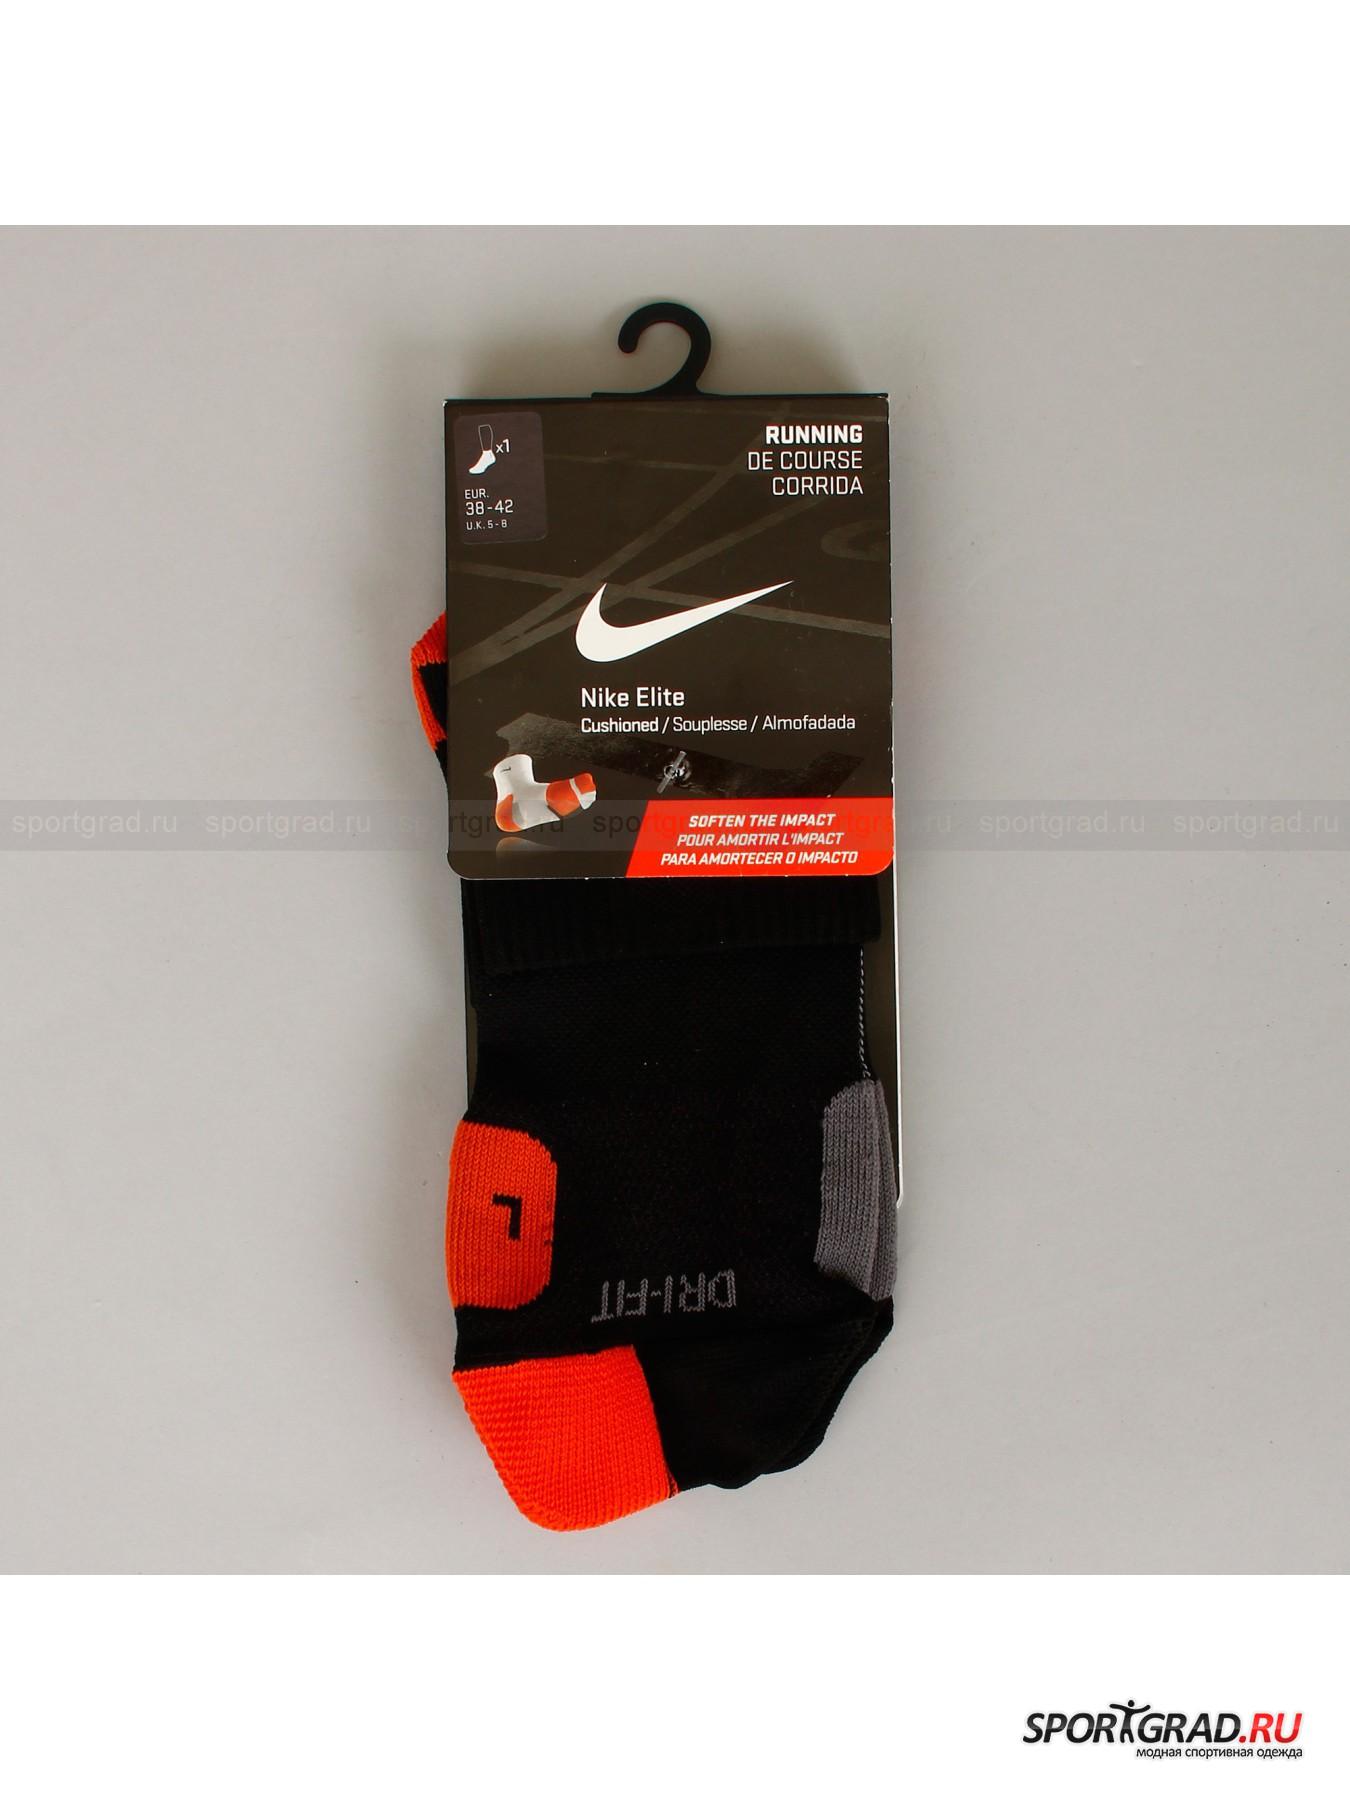 Носки для бега Elite Running Quarter NIKE